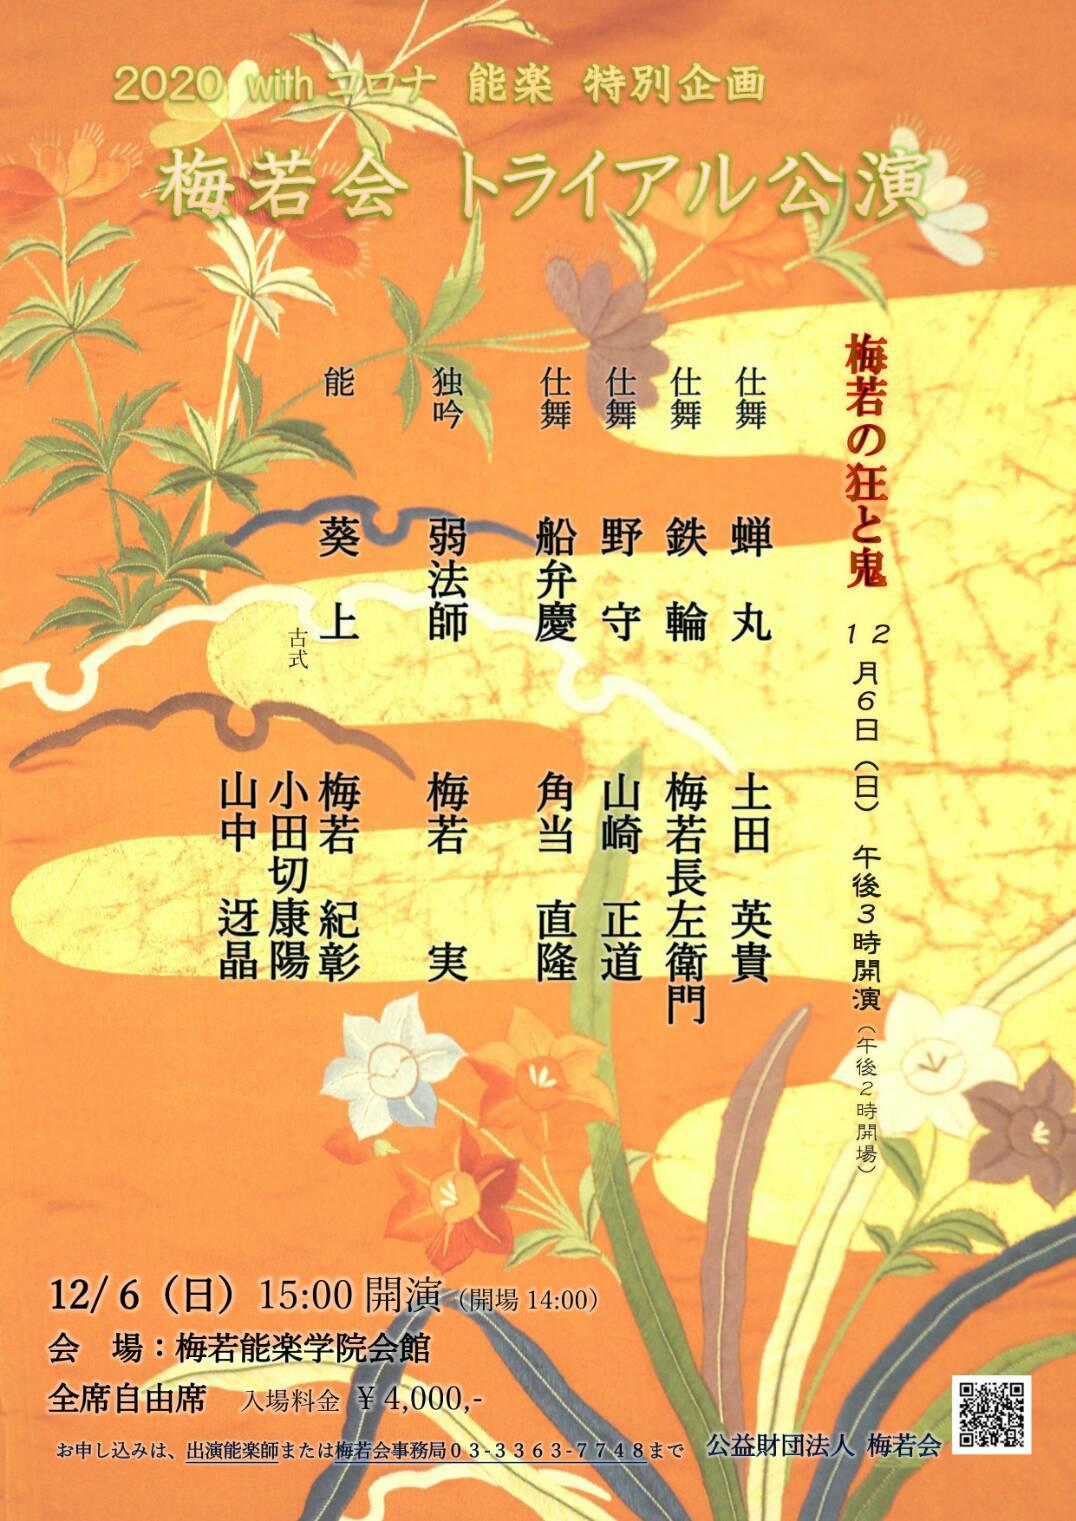 2020 with コロナ 能楽特別公演 梅若会 トライアル公演 12月公演  梅若の狂と鬼